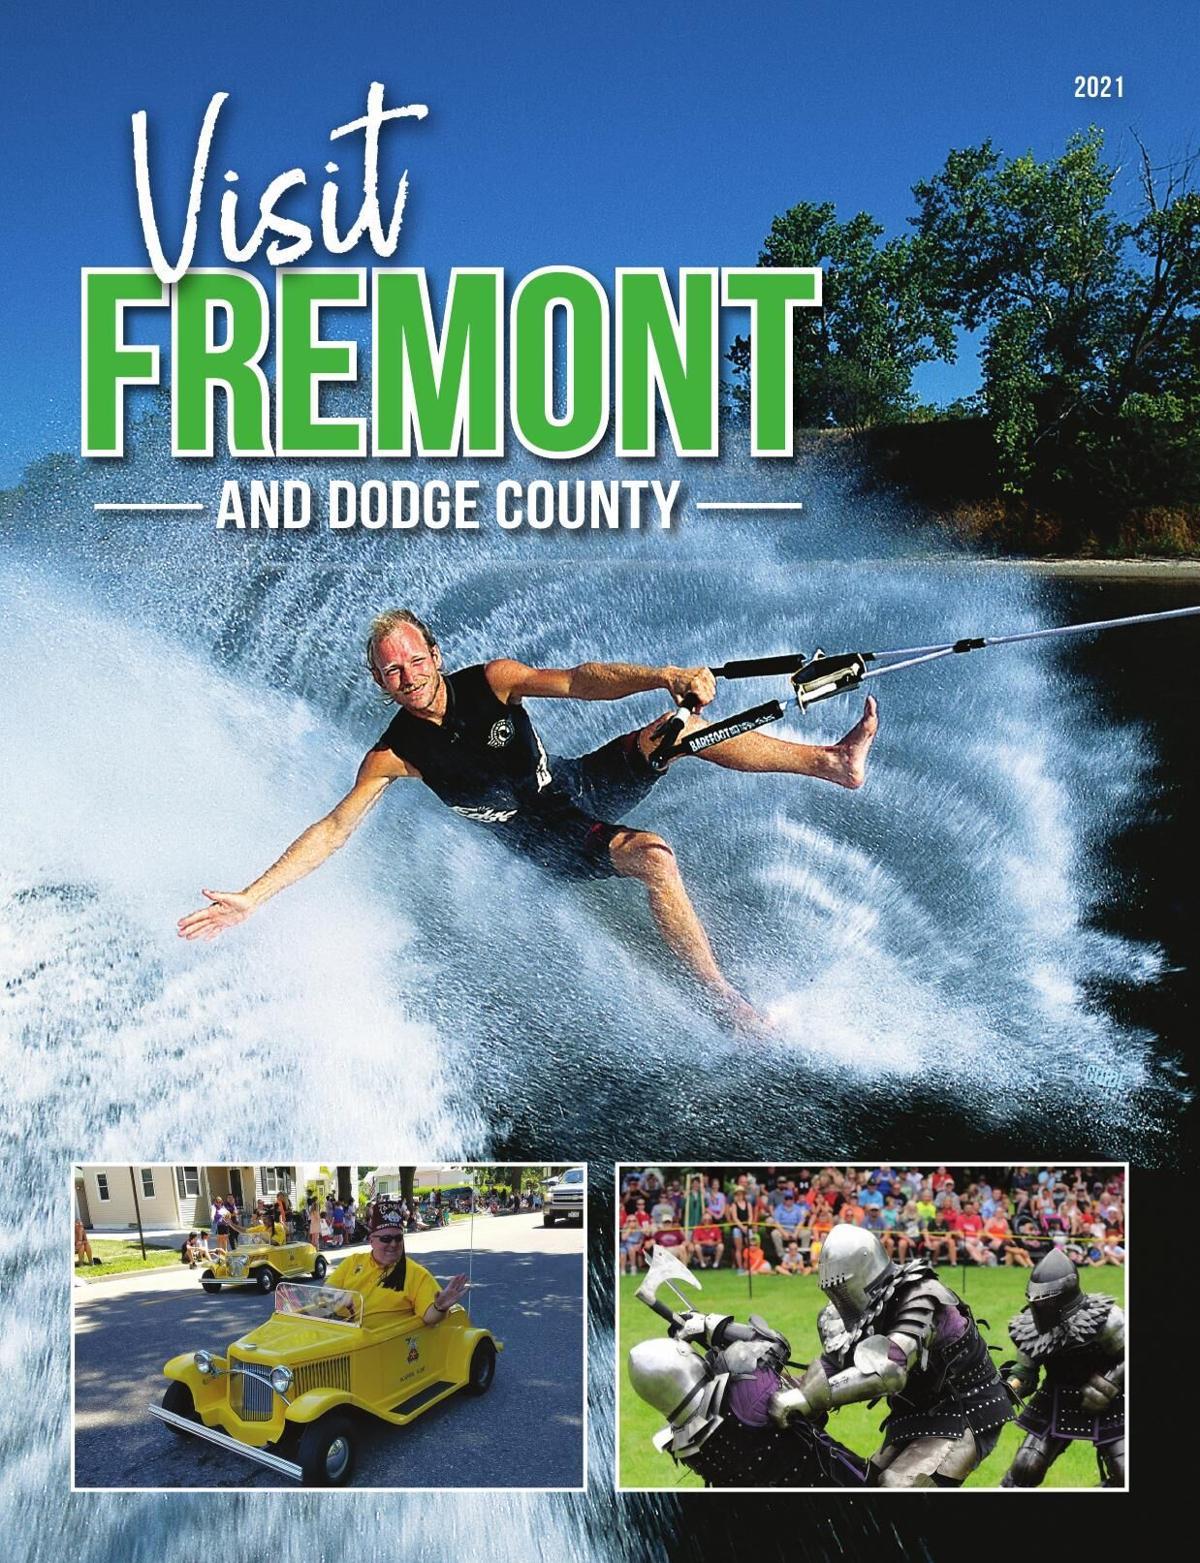 Visit Fremont and Dodge County 2021 1.pdf